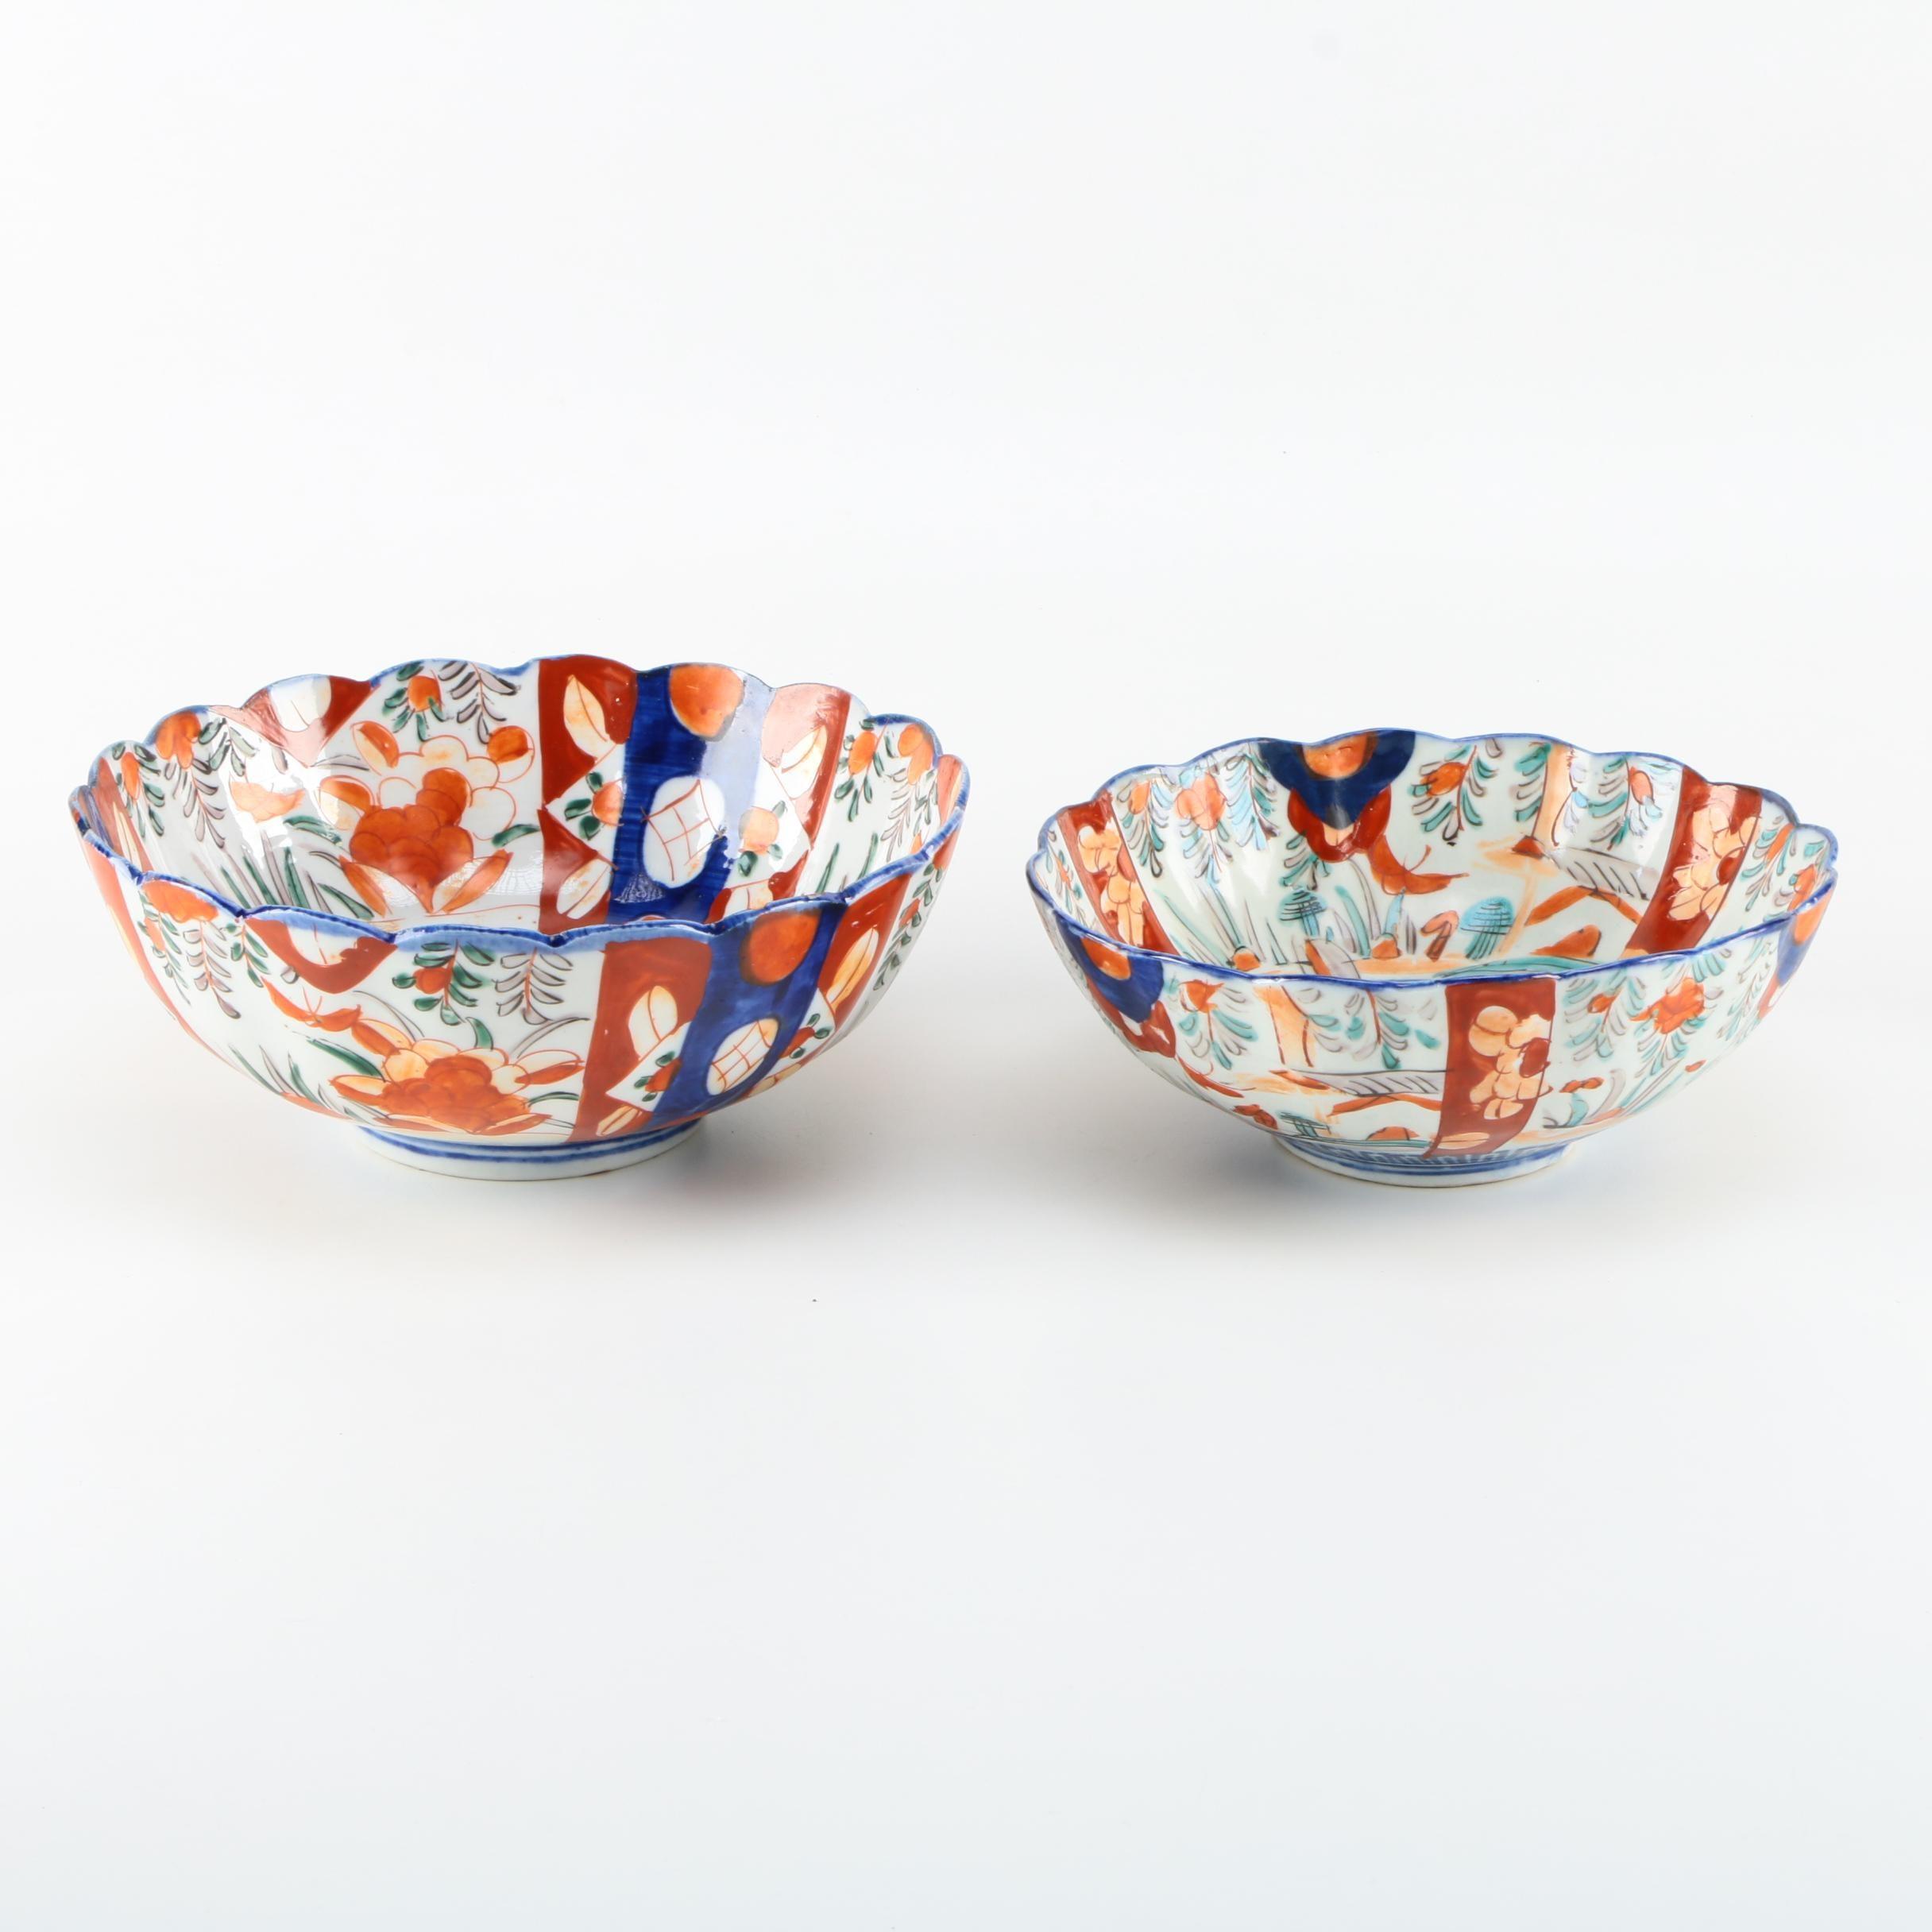 Pair of Imari Scallop Edge Bowls